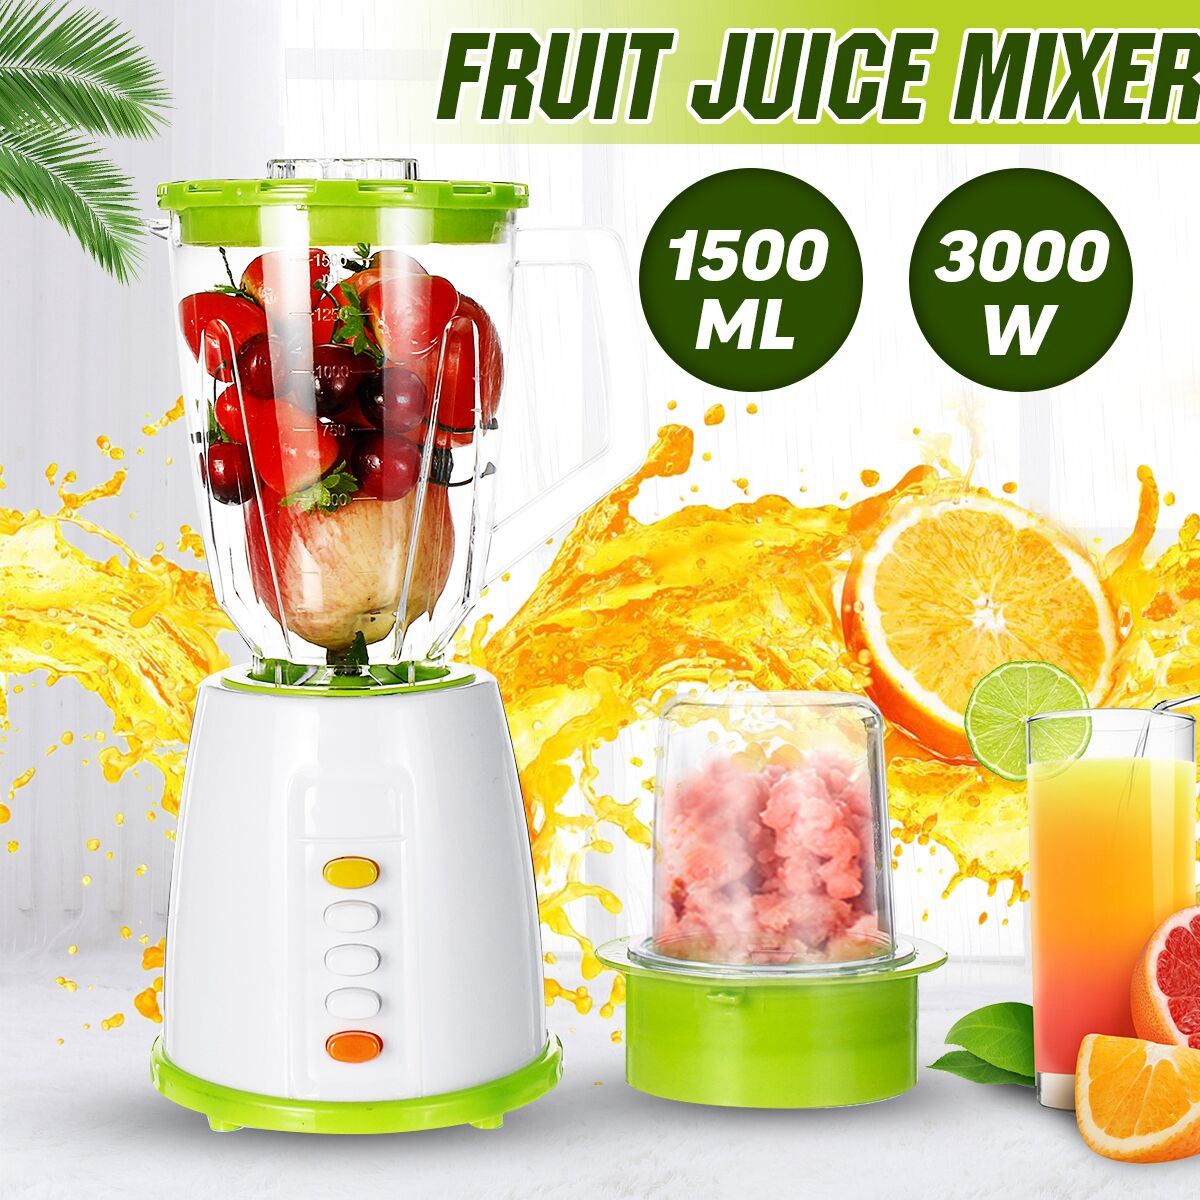 1500ML Multi-functional Nutrition Machine Juice Blenders Fruit Juicer Mixer Timer-Blenders Ice-Crusher Food-Processor Smoothies